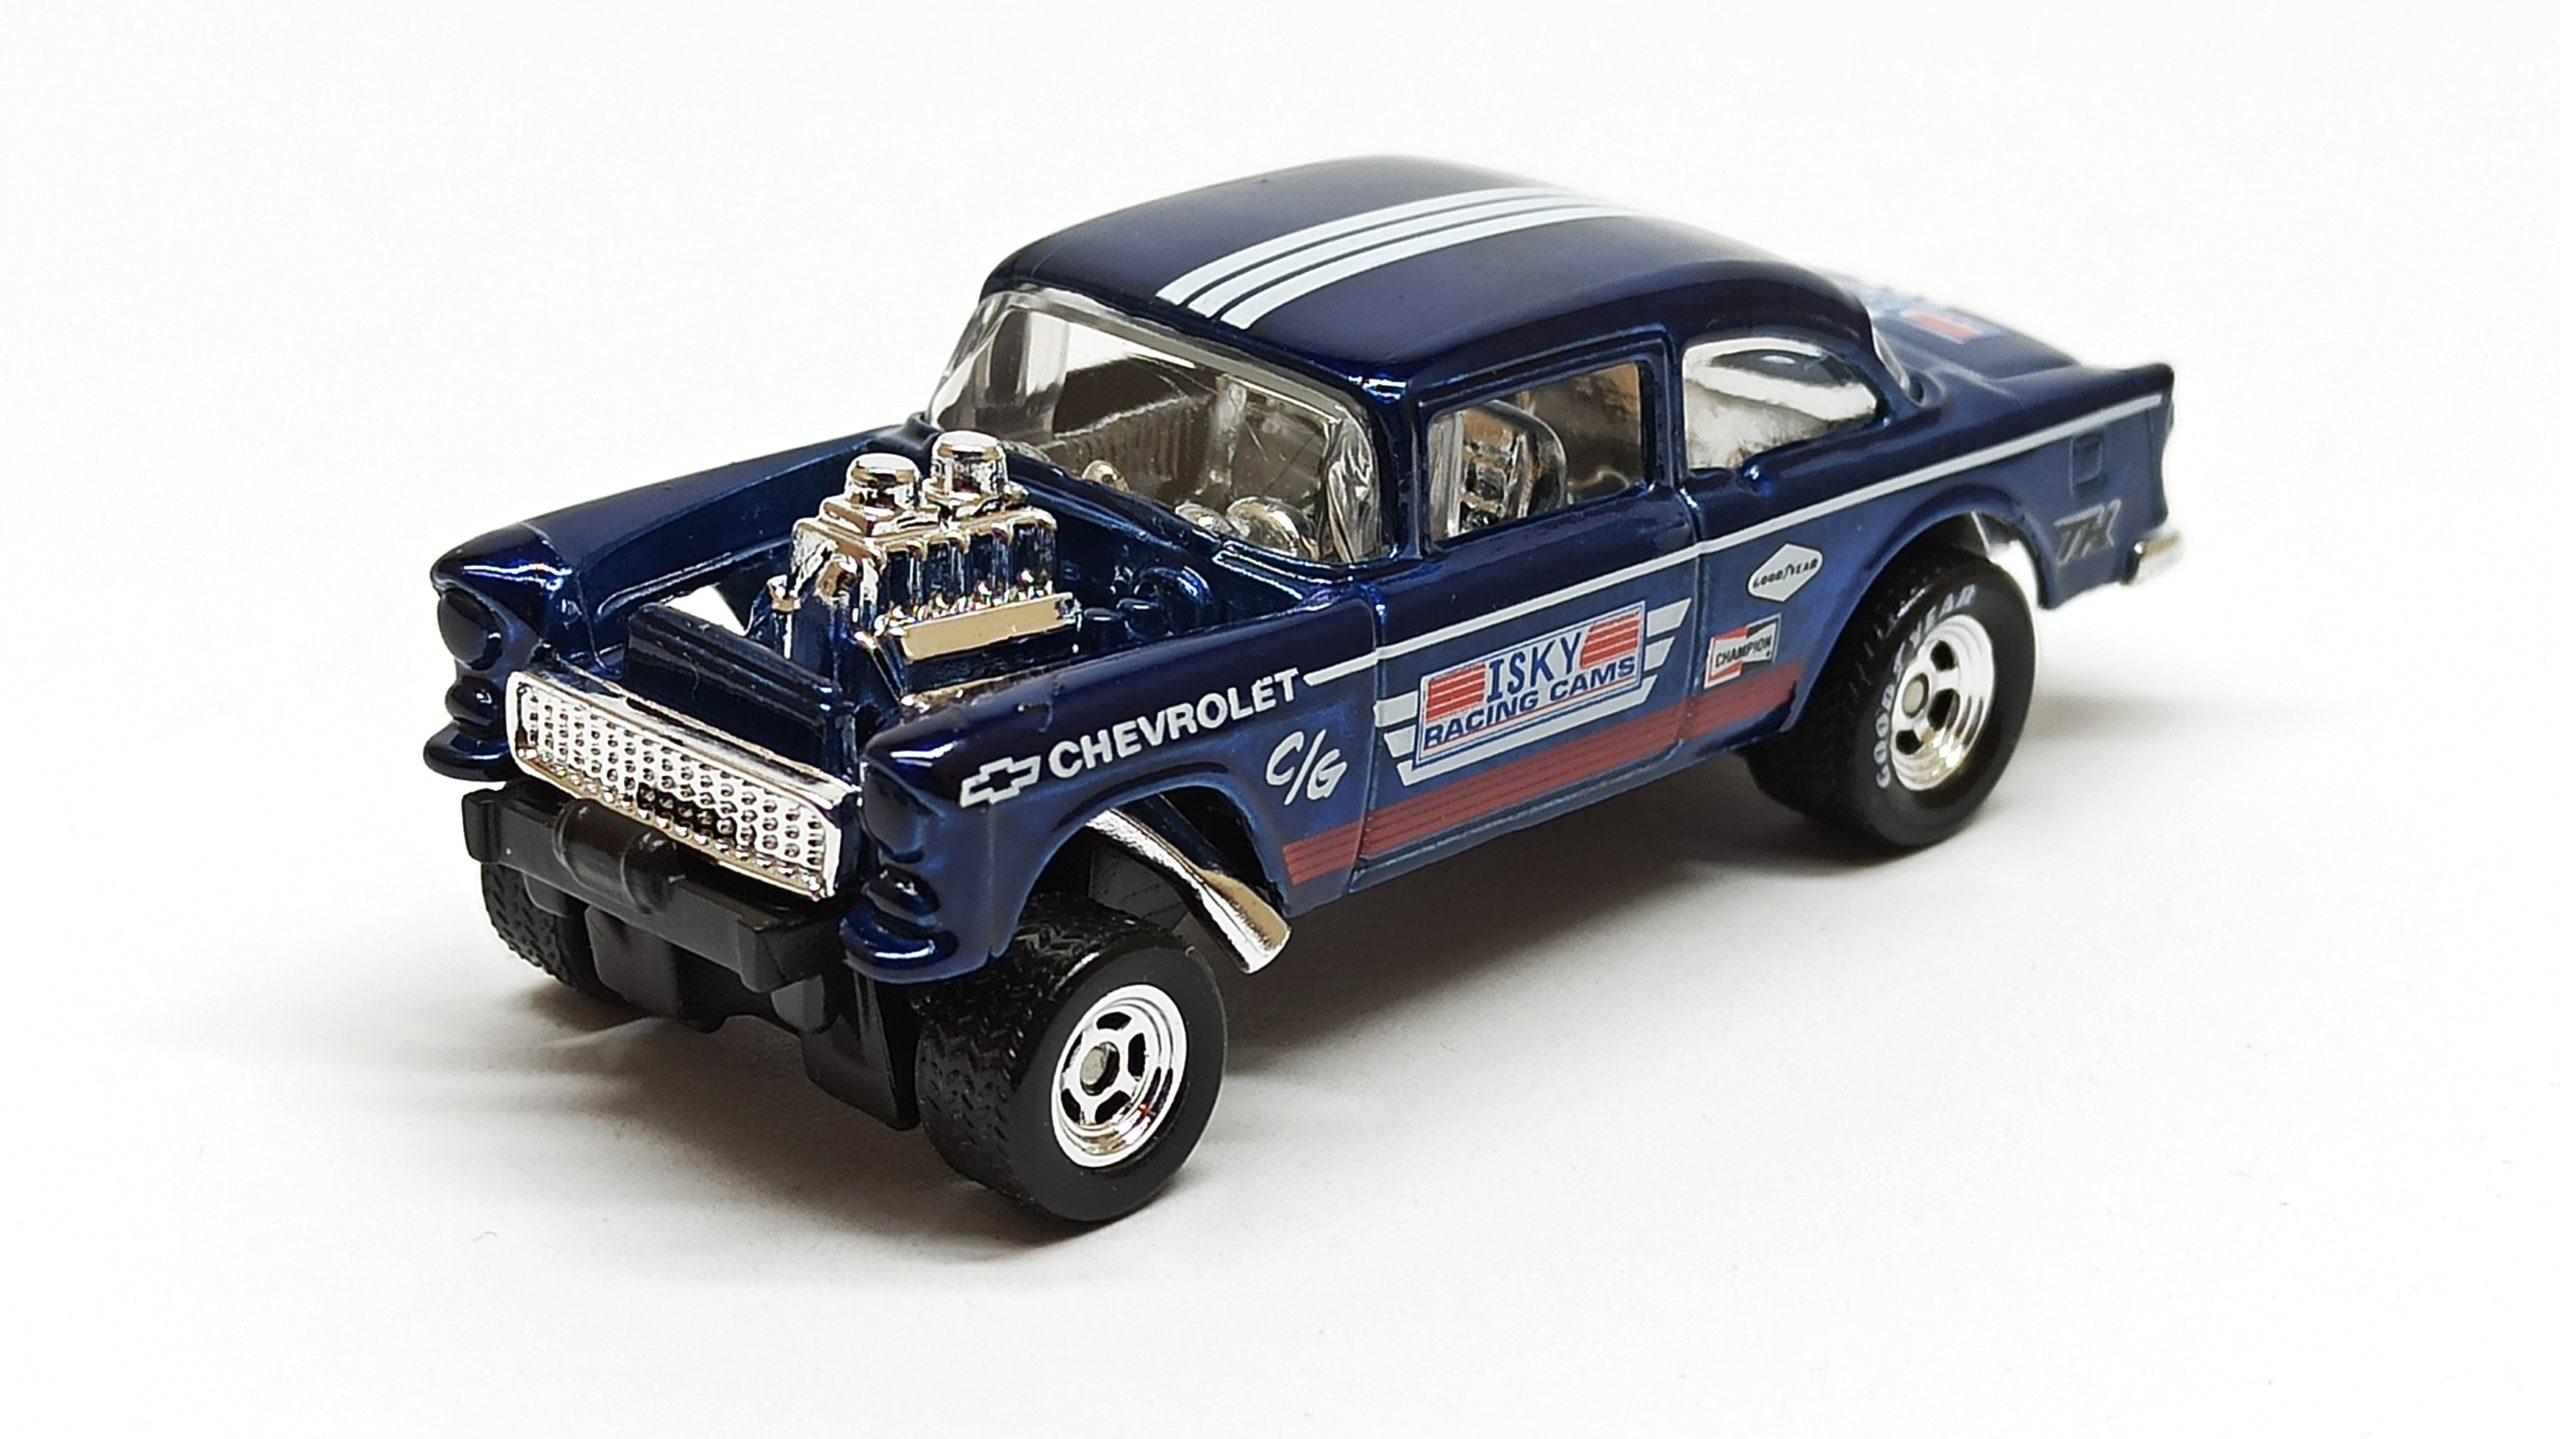 Hot Wheels '55 Chevy Bel Air Gasser (BFF38) 2014 (241/250) HW Workshop: HW Performance spectraflame dark blue Super Treasure Hunt (STH) top angle